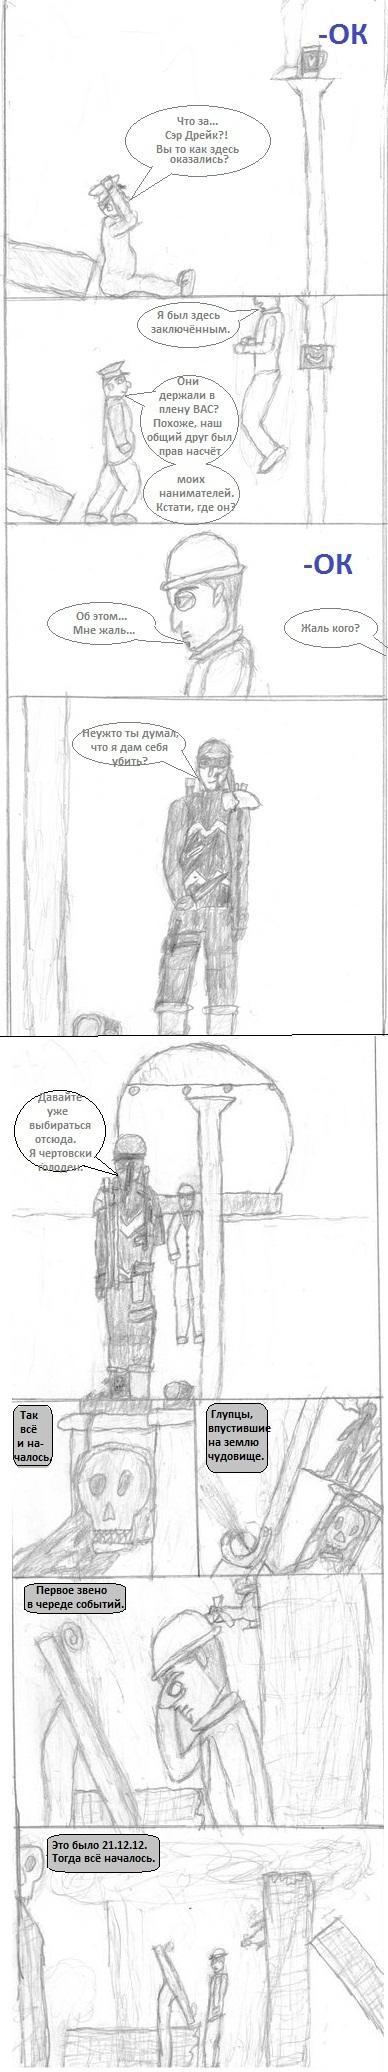 Комикс-битва №14 выпуск 145